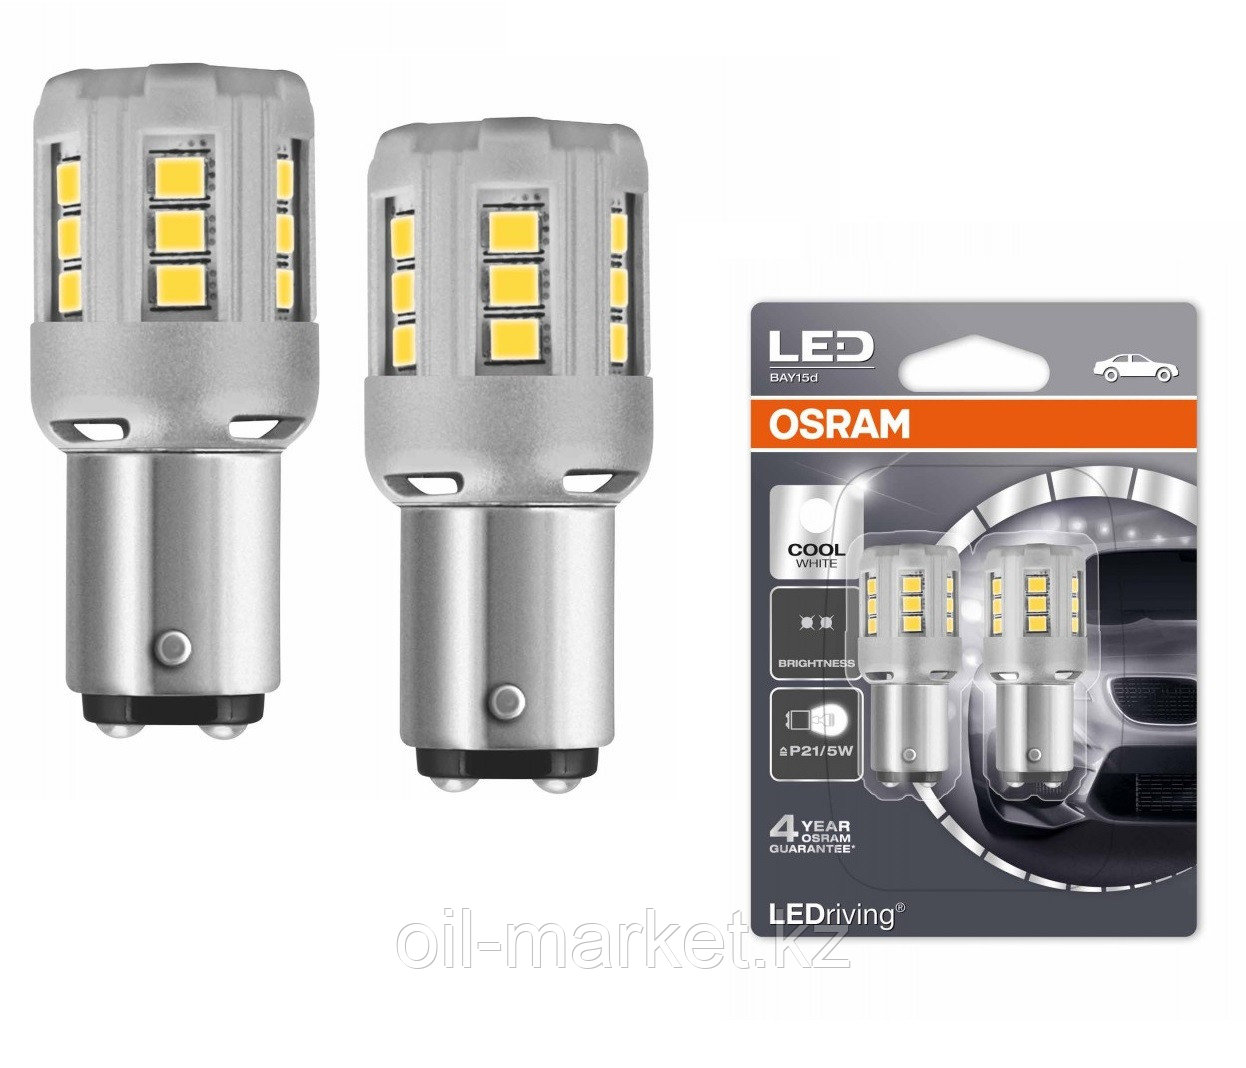 OSRAM Лампа светодиодная LED P21/5W 12V 2/0.4W BAY15d standard retrofit / холодный белый / 6000K / P21/5W